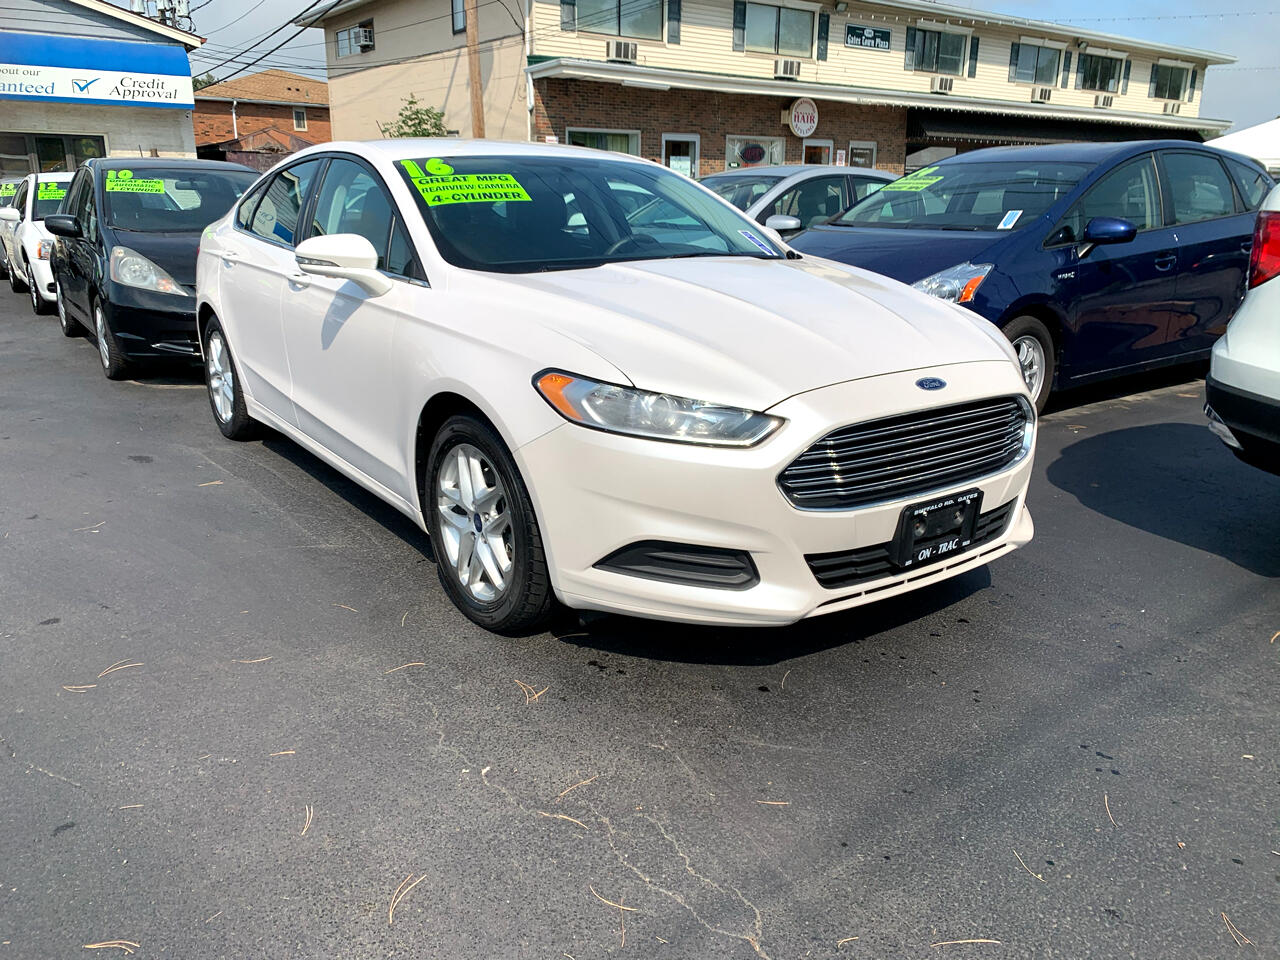 Ford Fusion 4dr Sdn SE FWD 2016